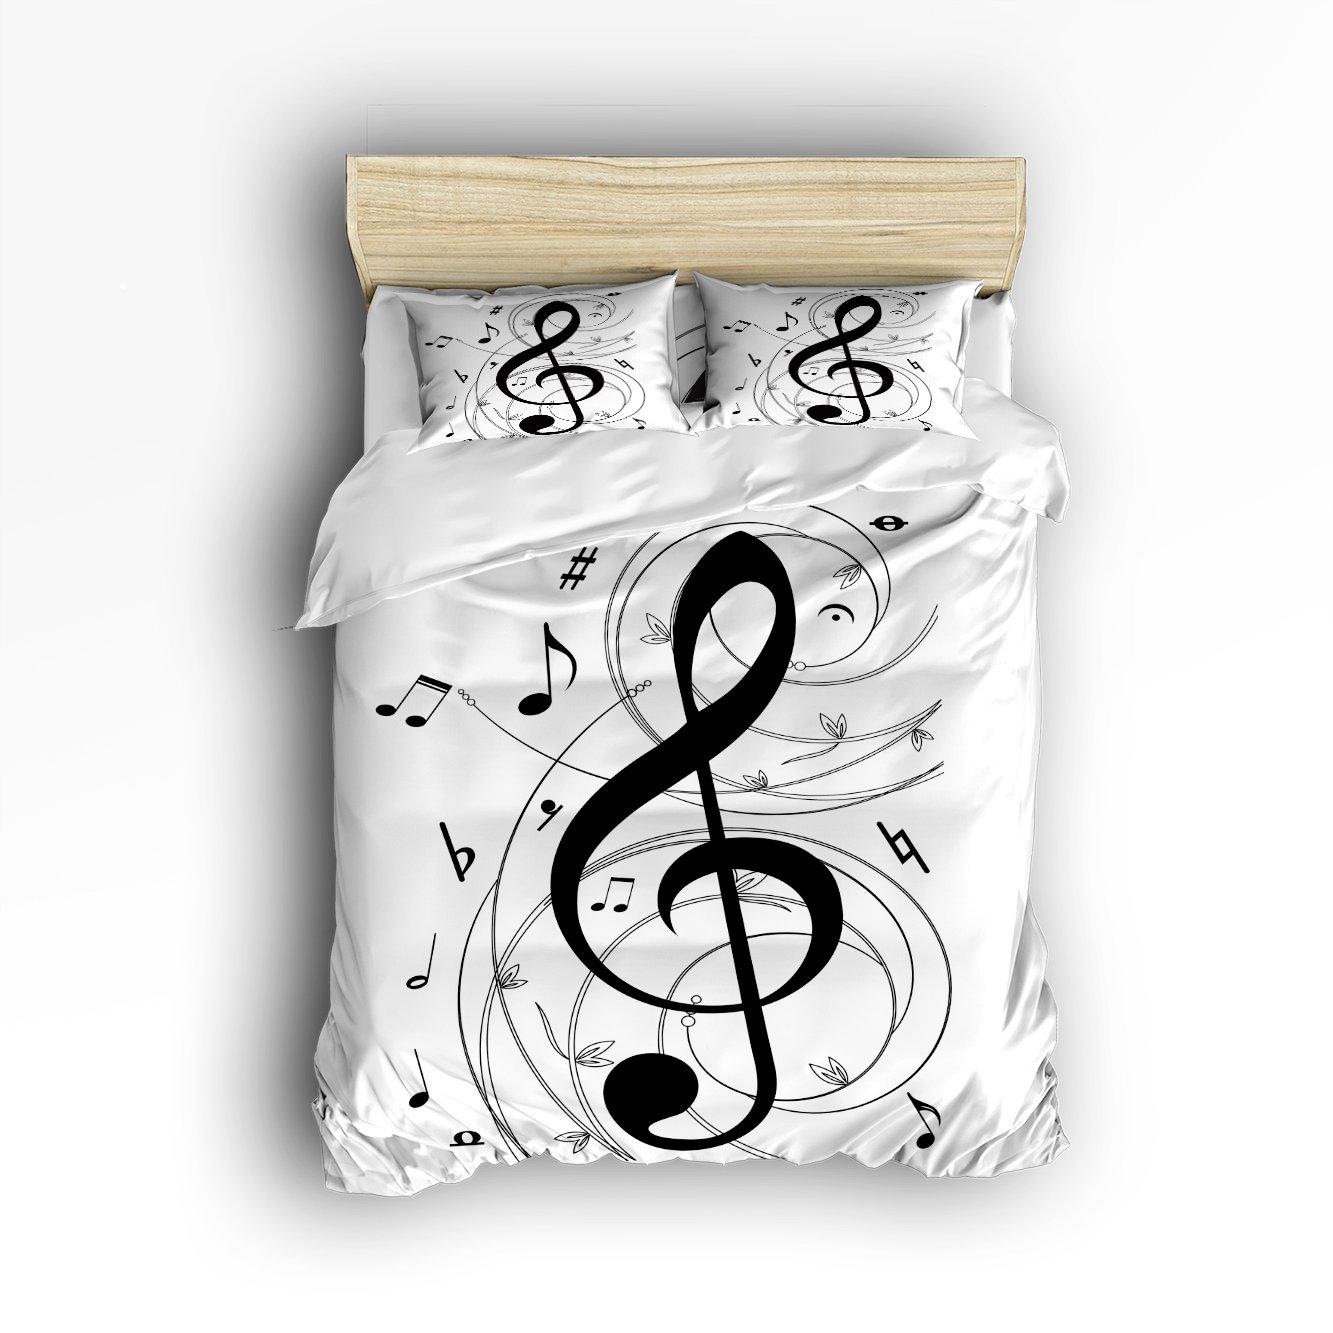 Full Size Bedding Set- Black White Music Notes Duvet Cover Set Bedspread for Childrens/Kids/Teens/Adults, 4 Piece 100% Cotton Vandarllin